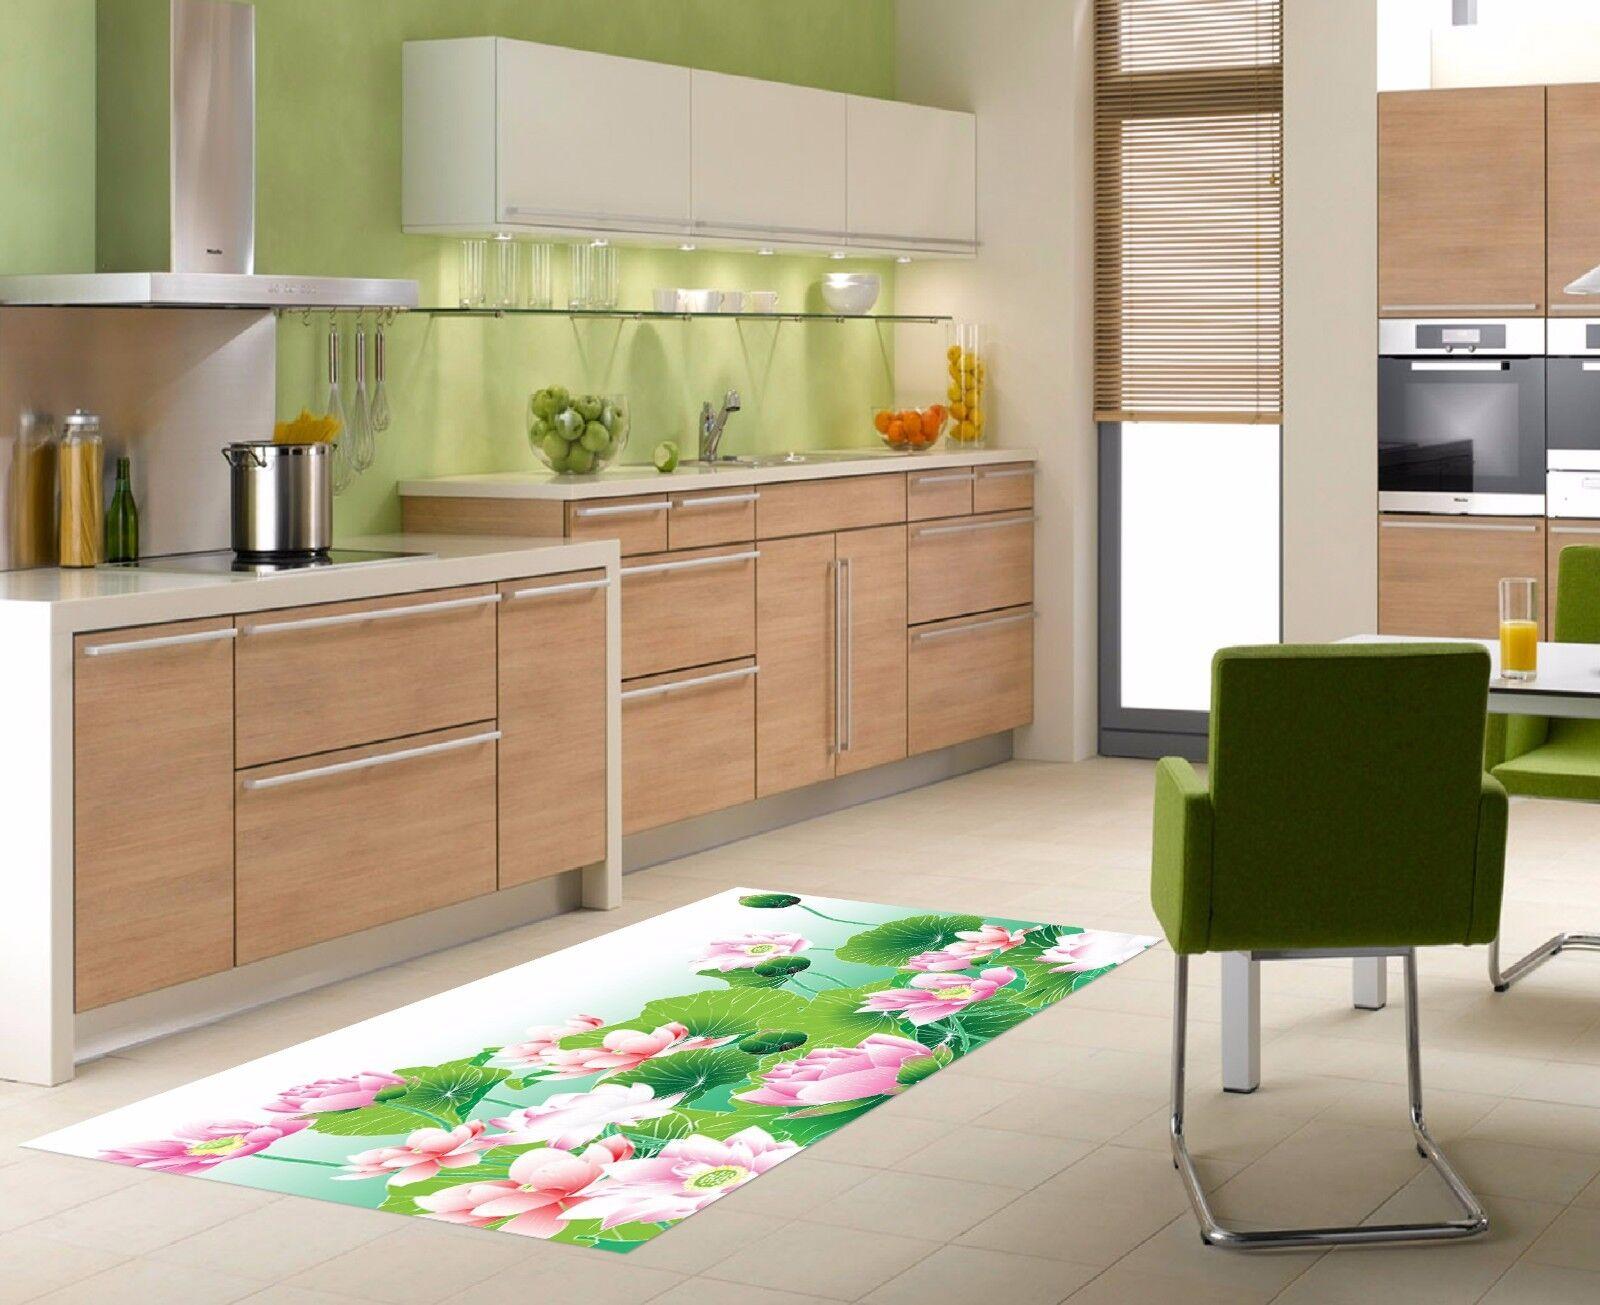 3D Lotus Flowers Kitchen Mat Floor Murals Wall Print Wall Deco AJ WALLPAPER AU